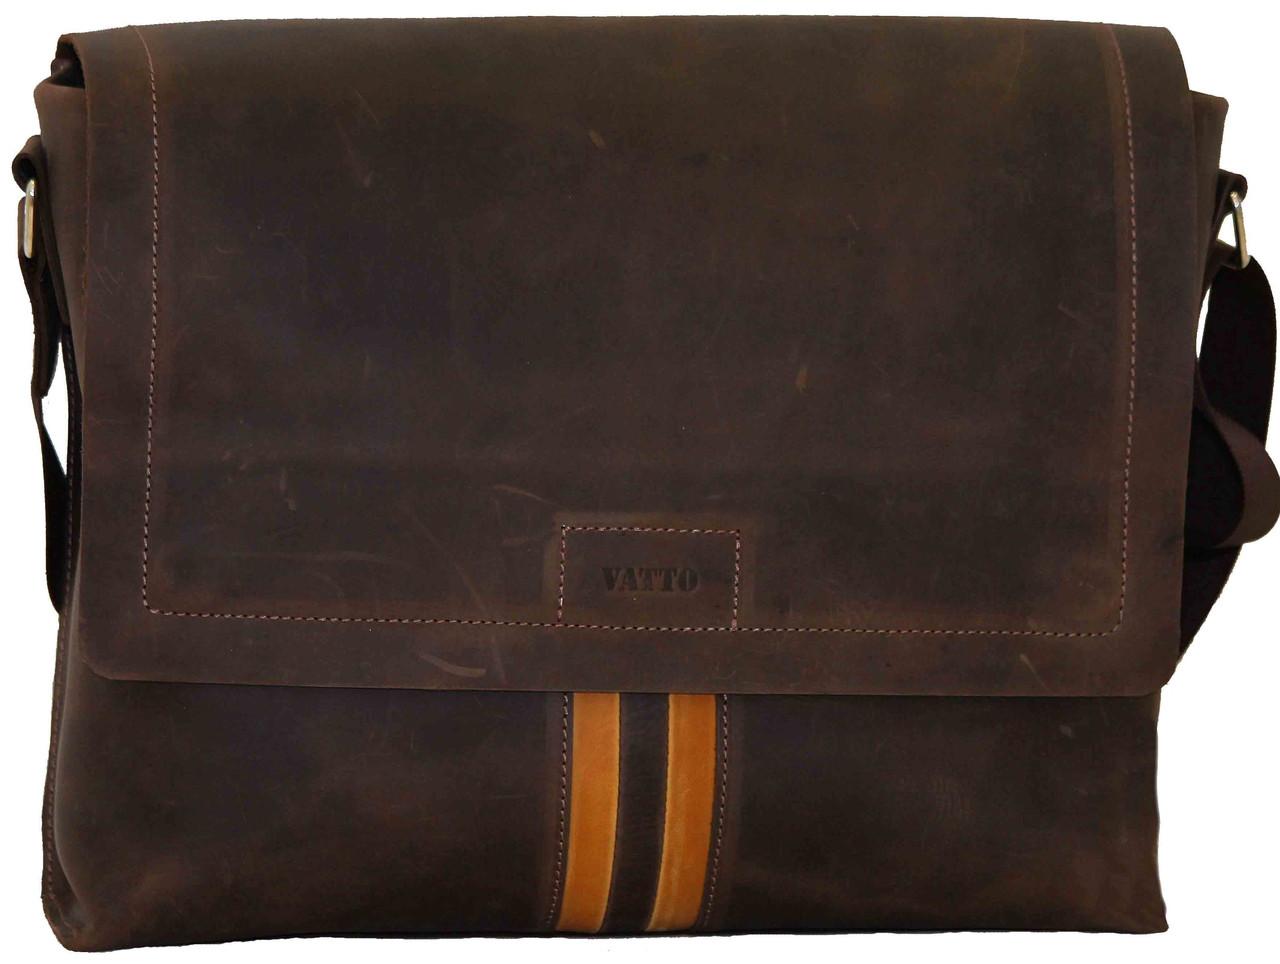 Кожаная мужская сумка Mk34 коричневая